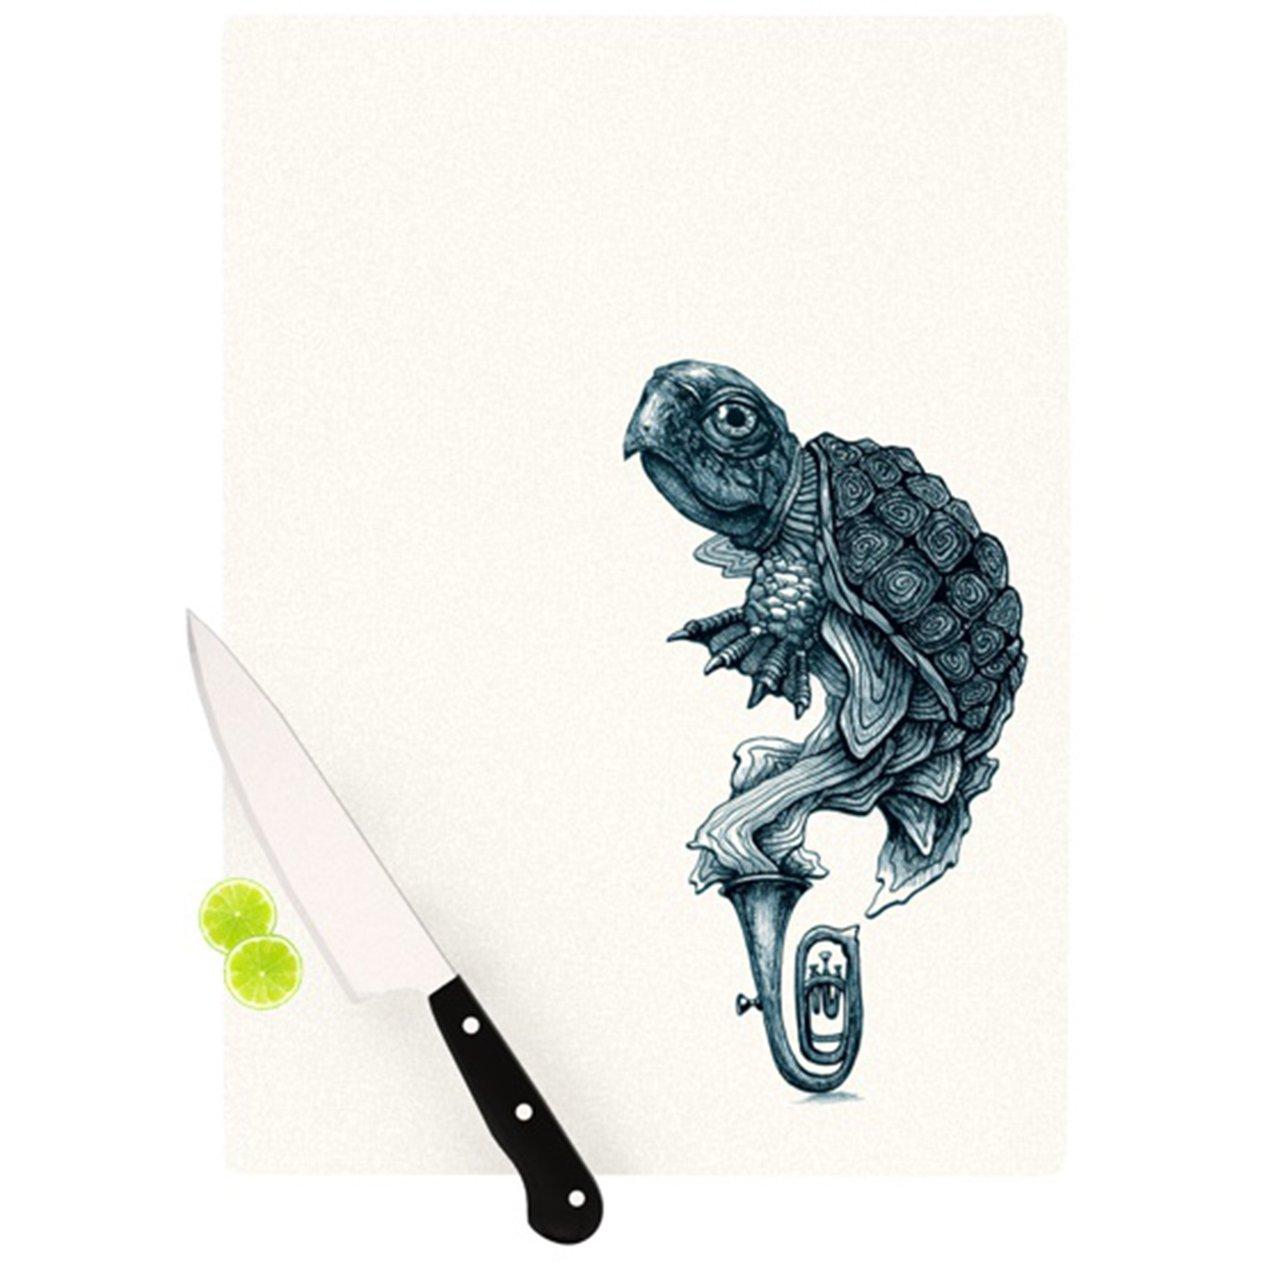 Kess InHouse Graham Curran Turtle Tuba Cutting Board 11.5 by 15.75-Inch